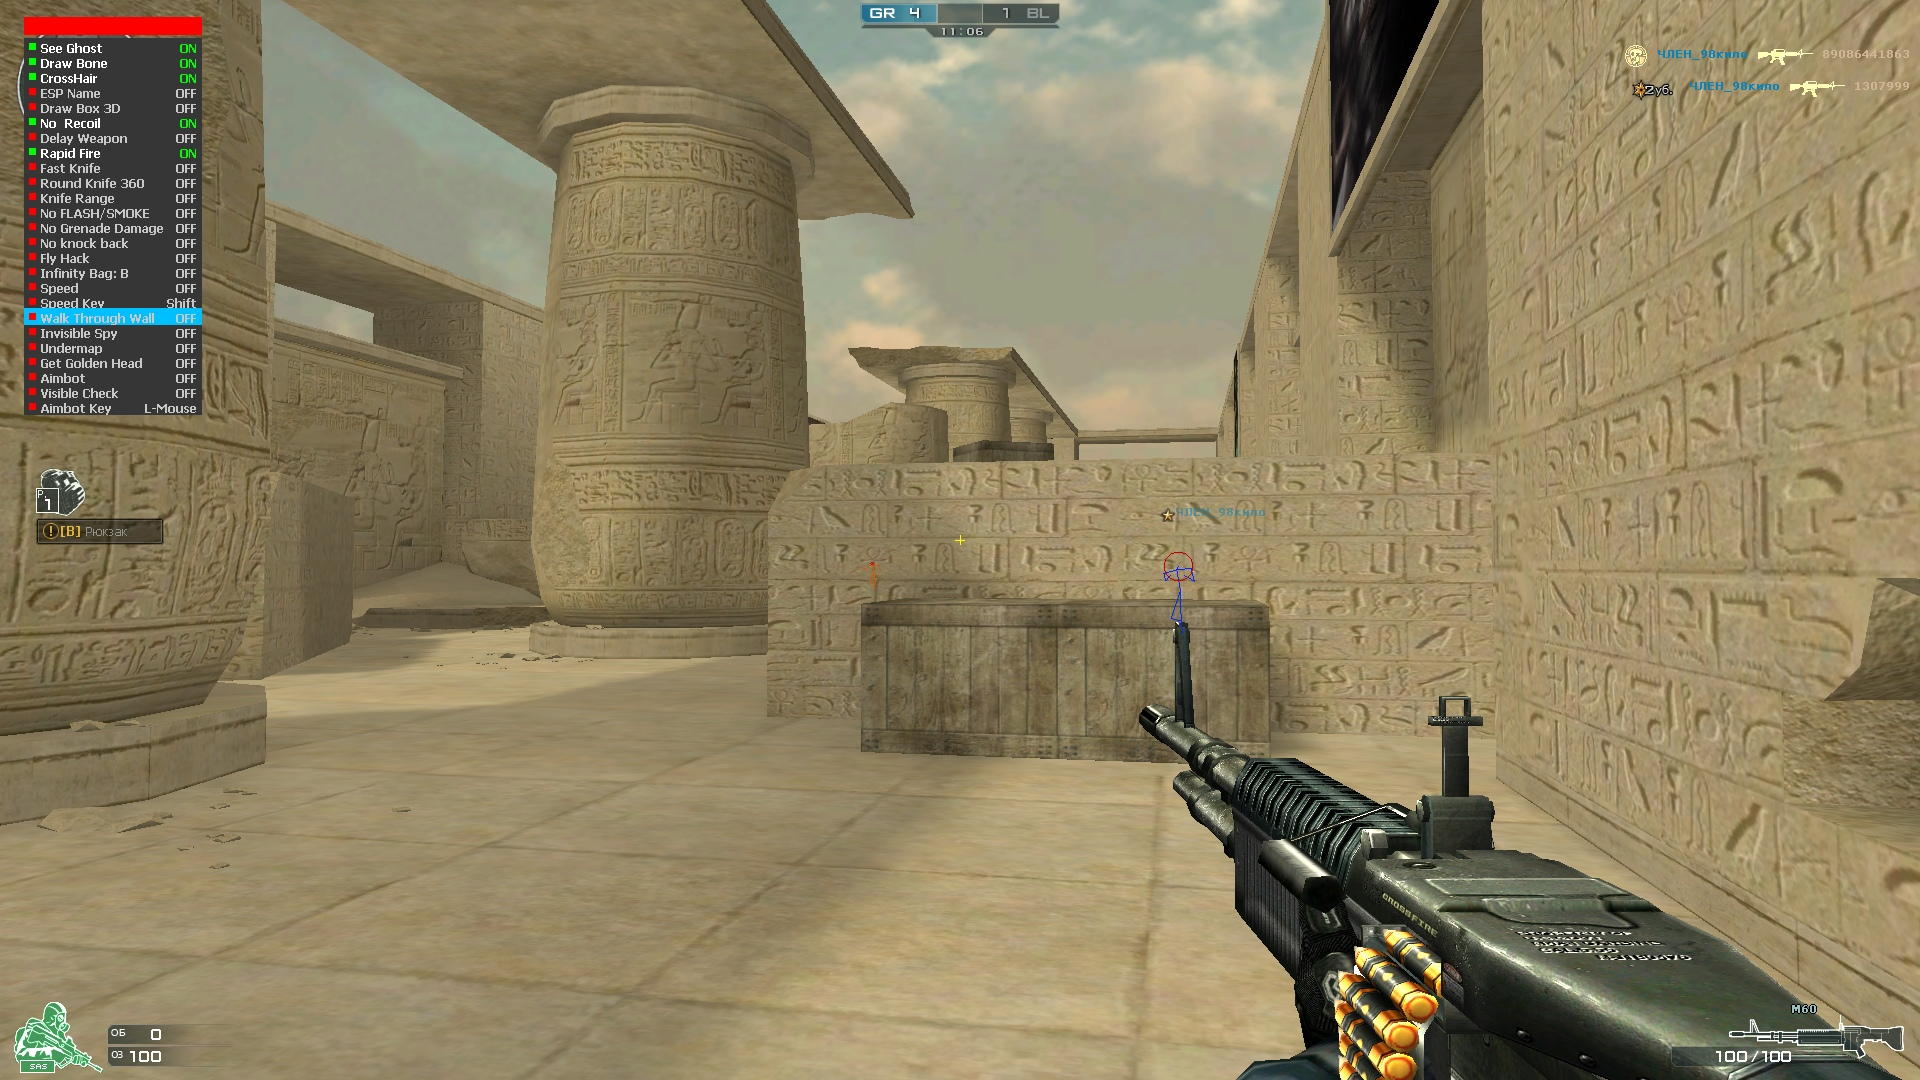 UNREAL D3D KILLER HACK Для CrossFire